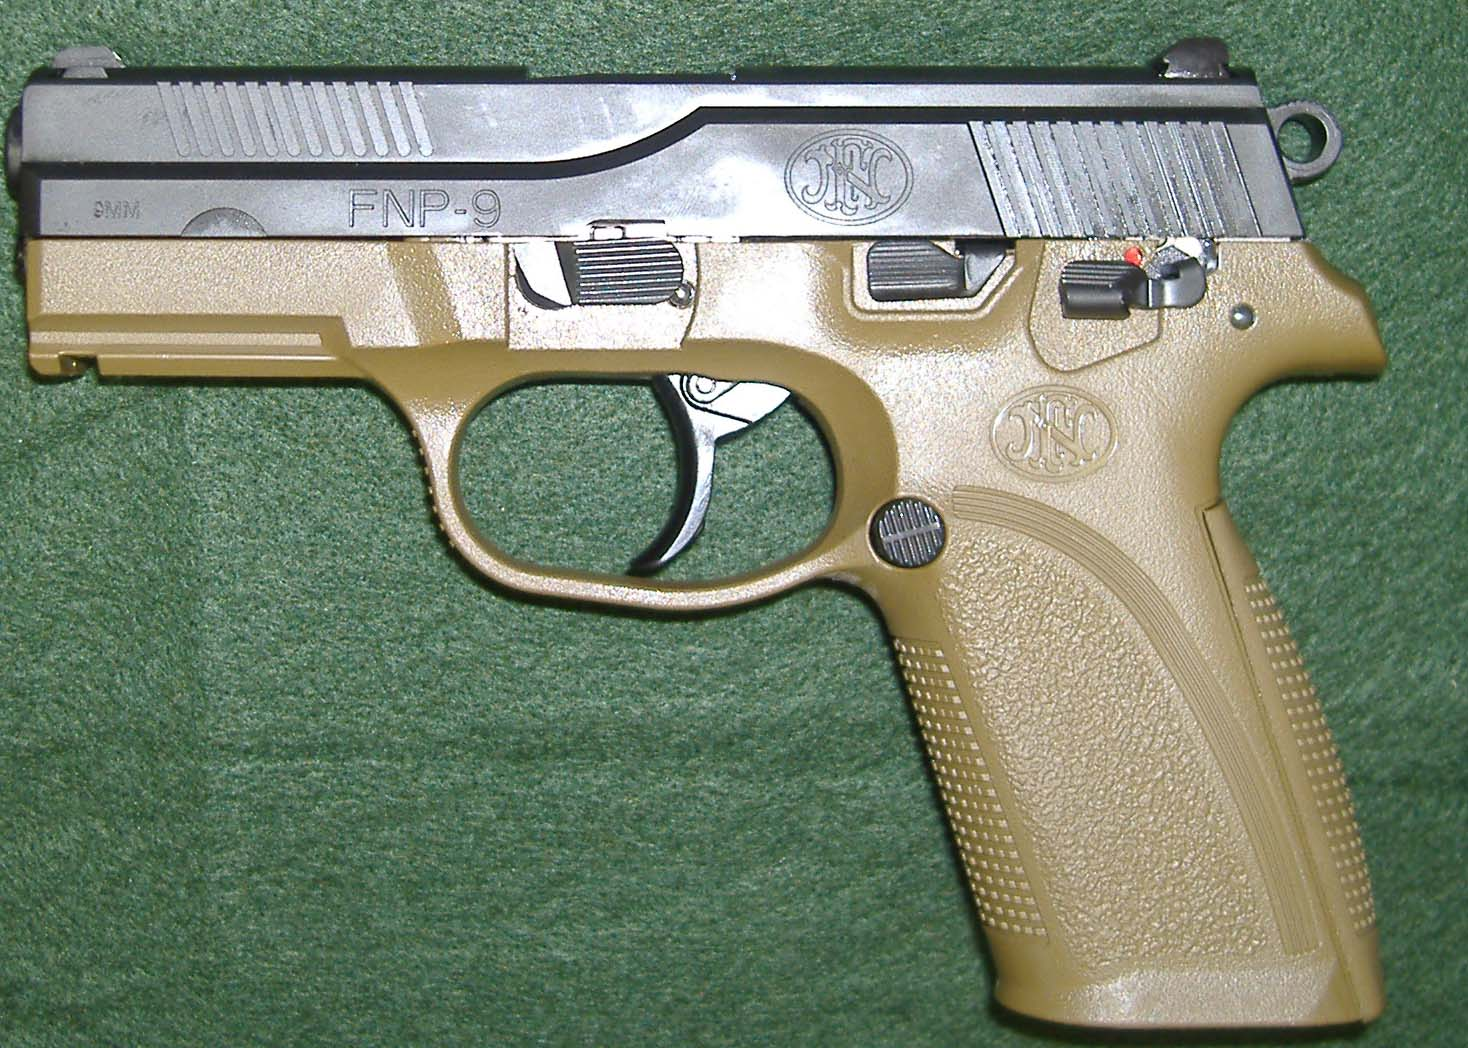 Mountain Shadow Arms - Gunsmithing, Firearms, Custom Rifles